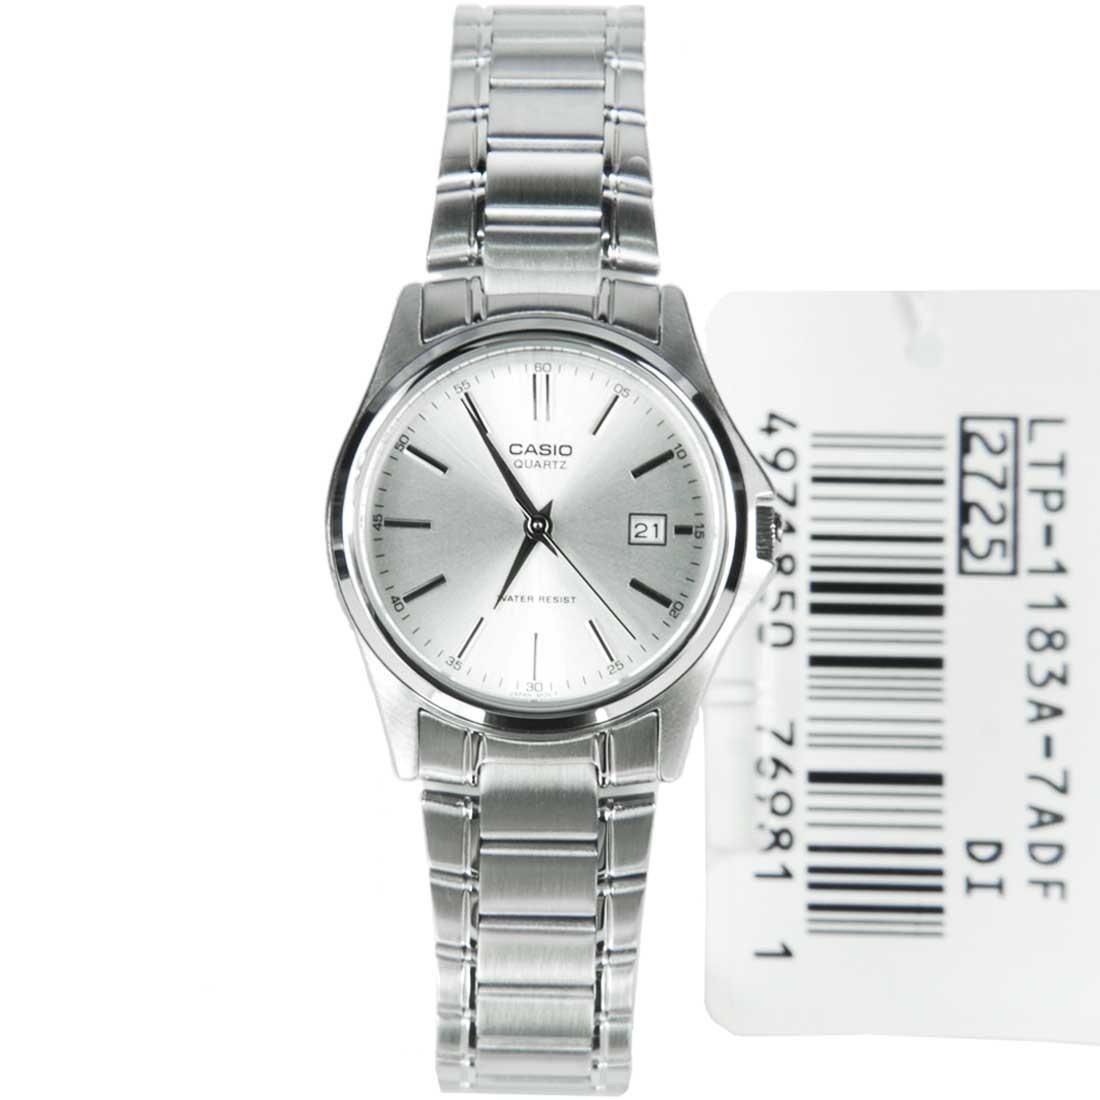 Compra Reloj Casio Dama Modelo Ltp 1183d-7a - Blanco online  f6ccd42f3609